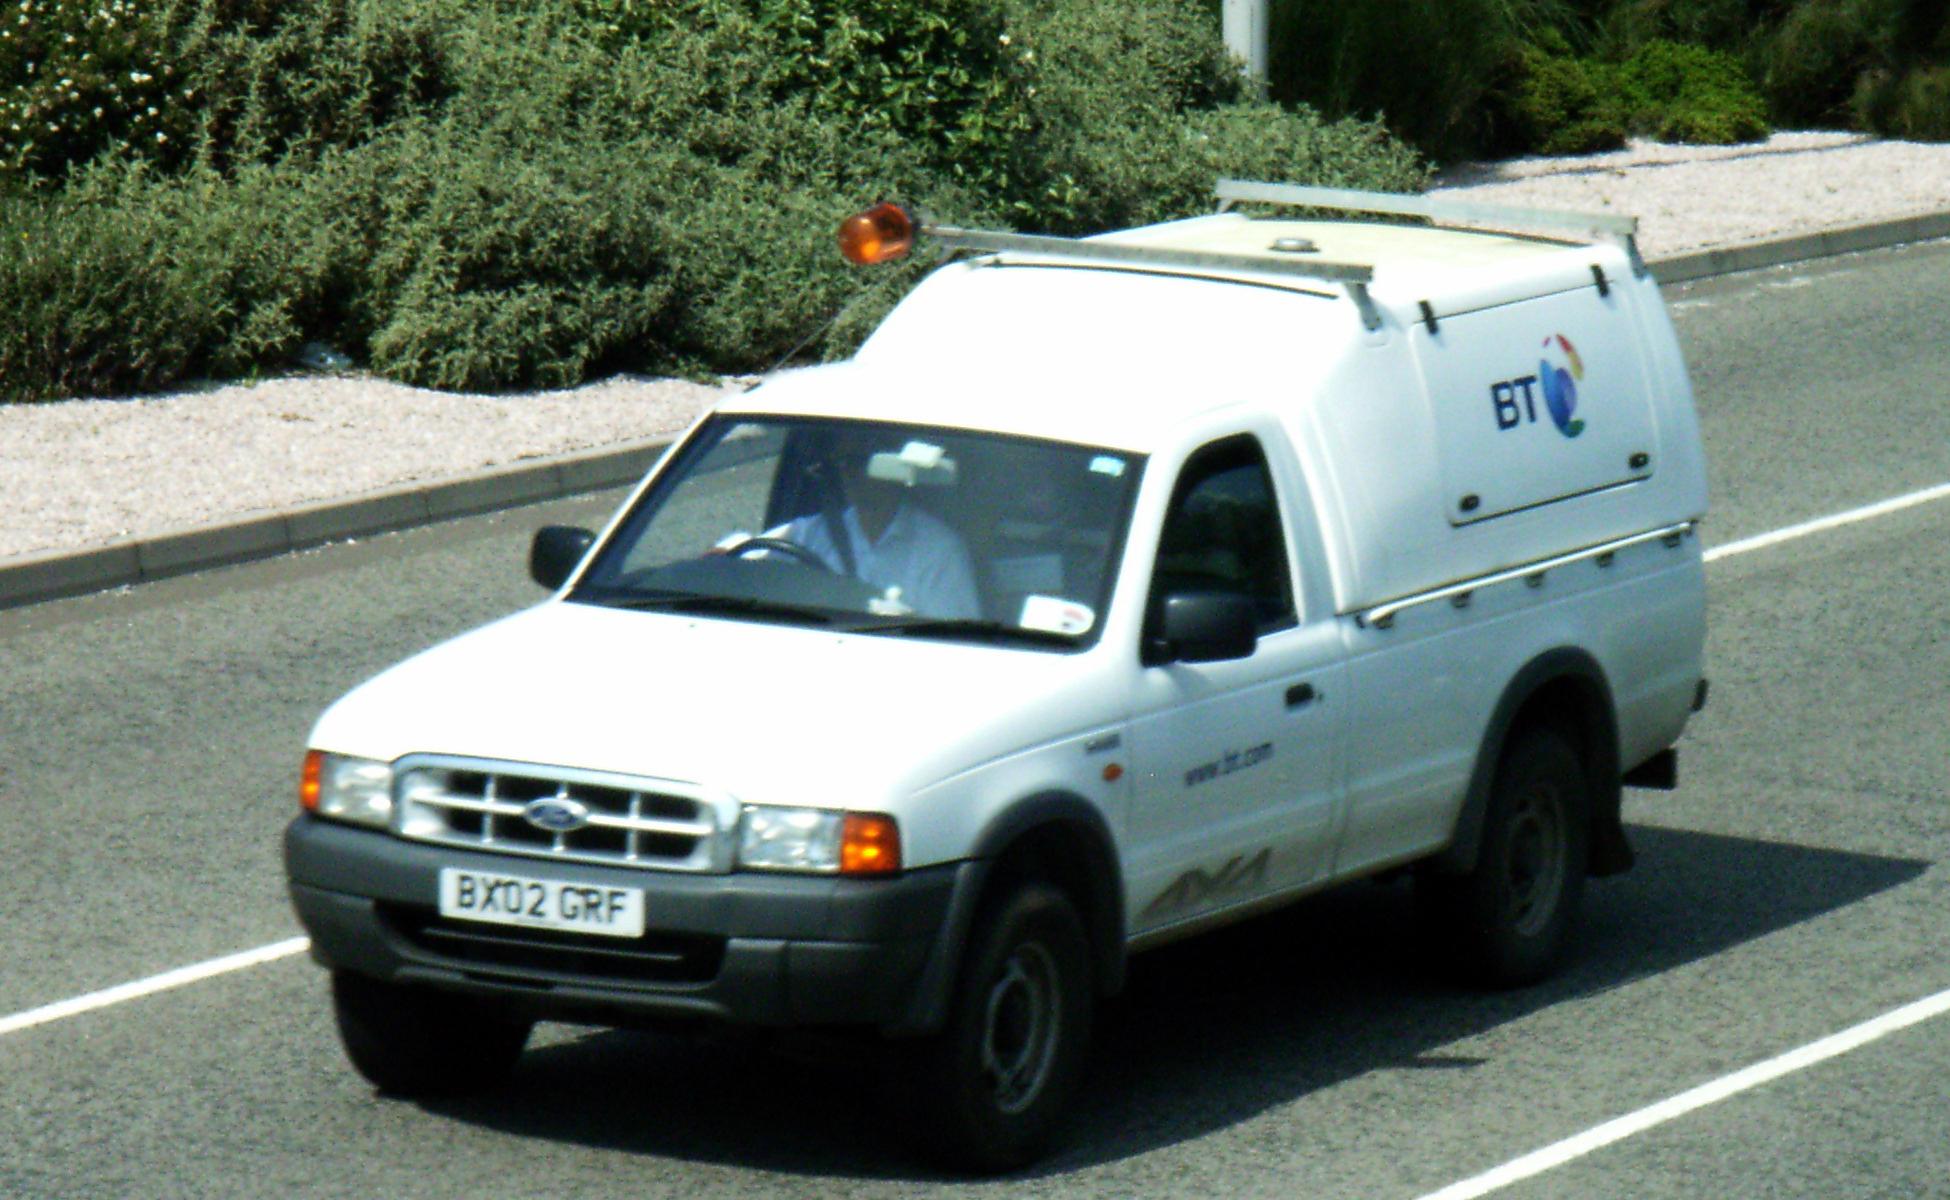 2002 ford ranger xlt extended cab pickup 3 0l v6 manual 6 0 ft bed rh carspecs us 2004 ford ranger xlt manual 2002 ford ranger xlt repair manual pdf